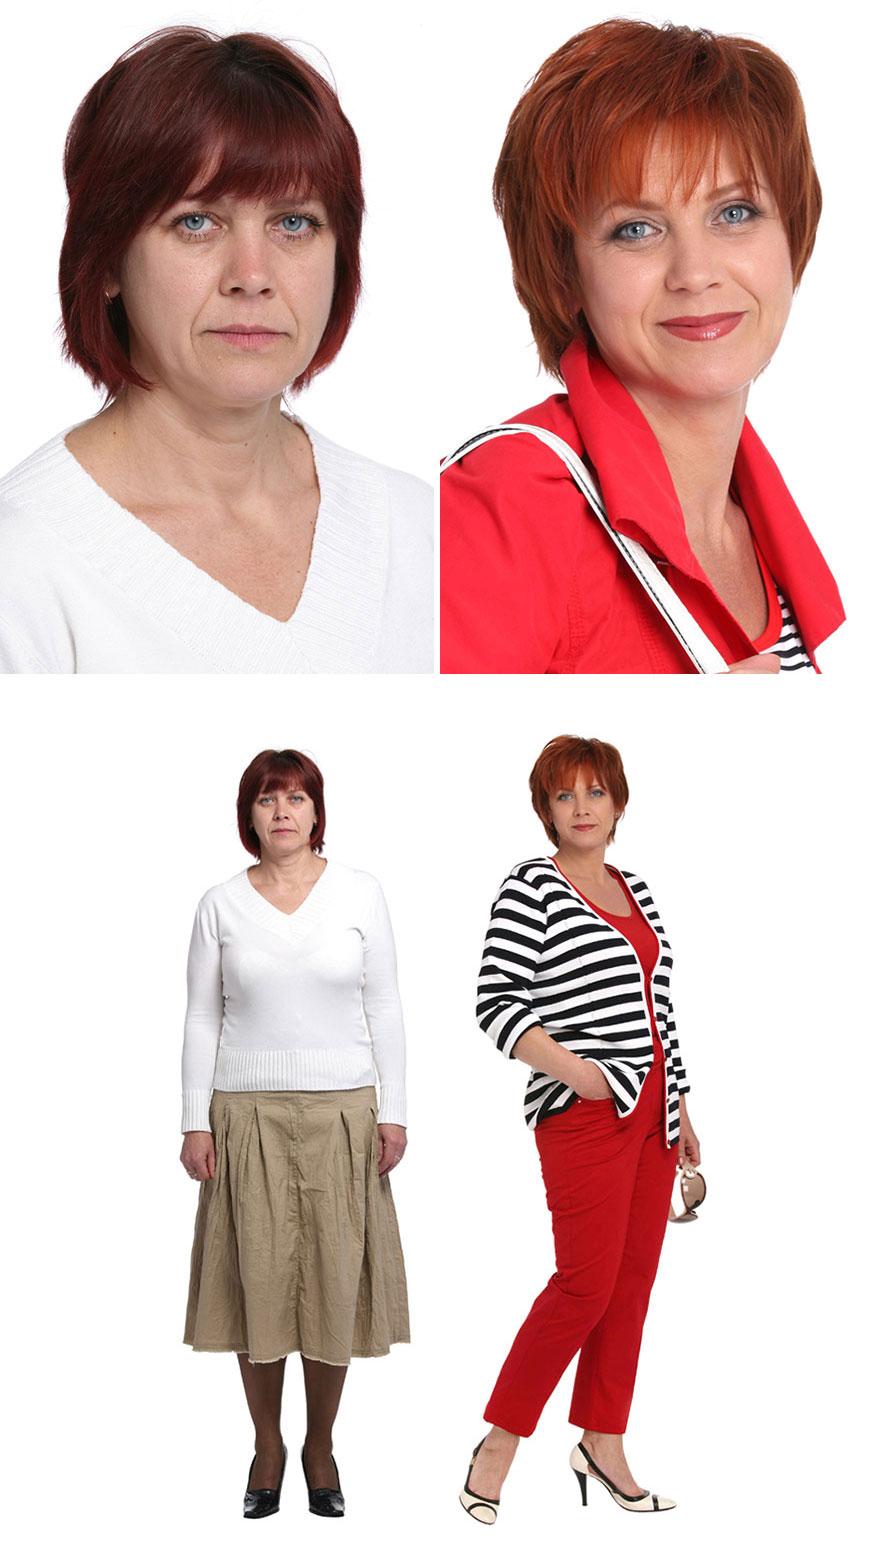 before-after-makeup-woman-style-change-konstantin-bogomolov-12